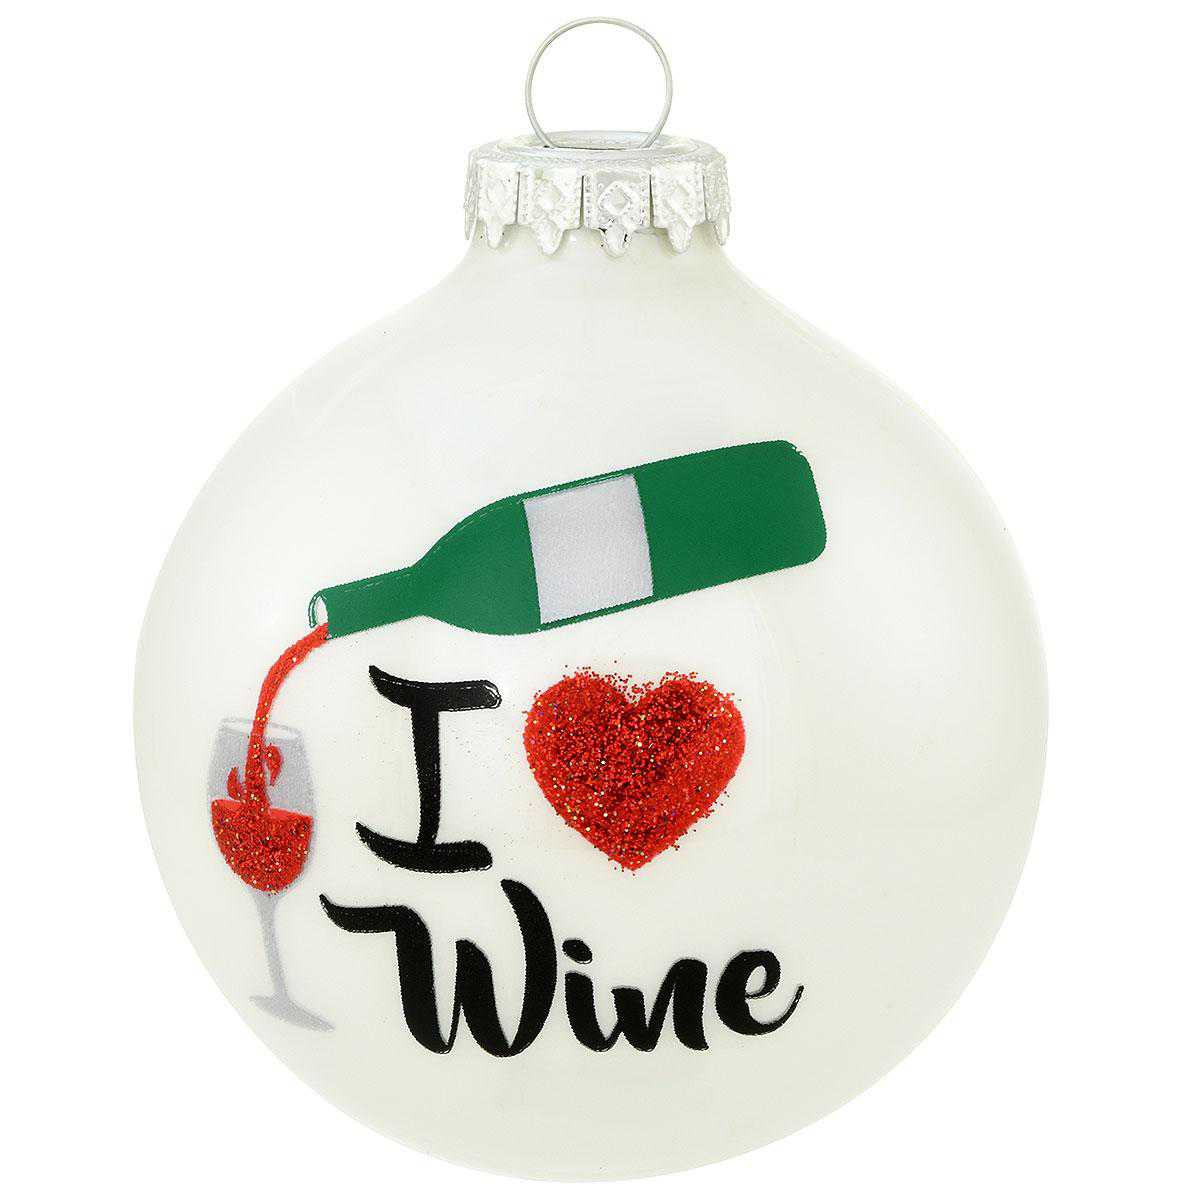 BR 7225 I LOVE WINE WHITE